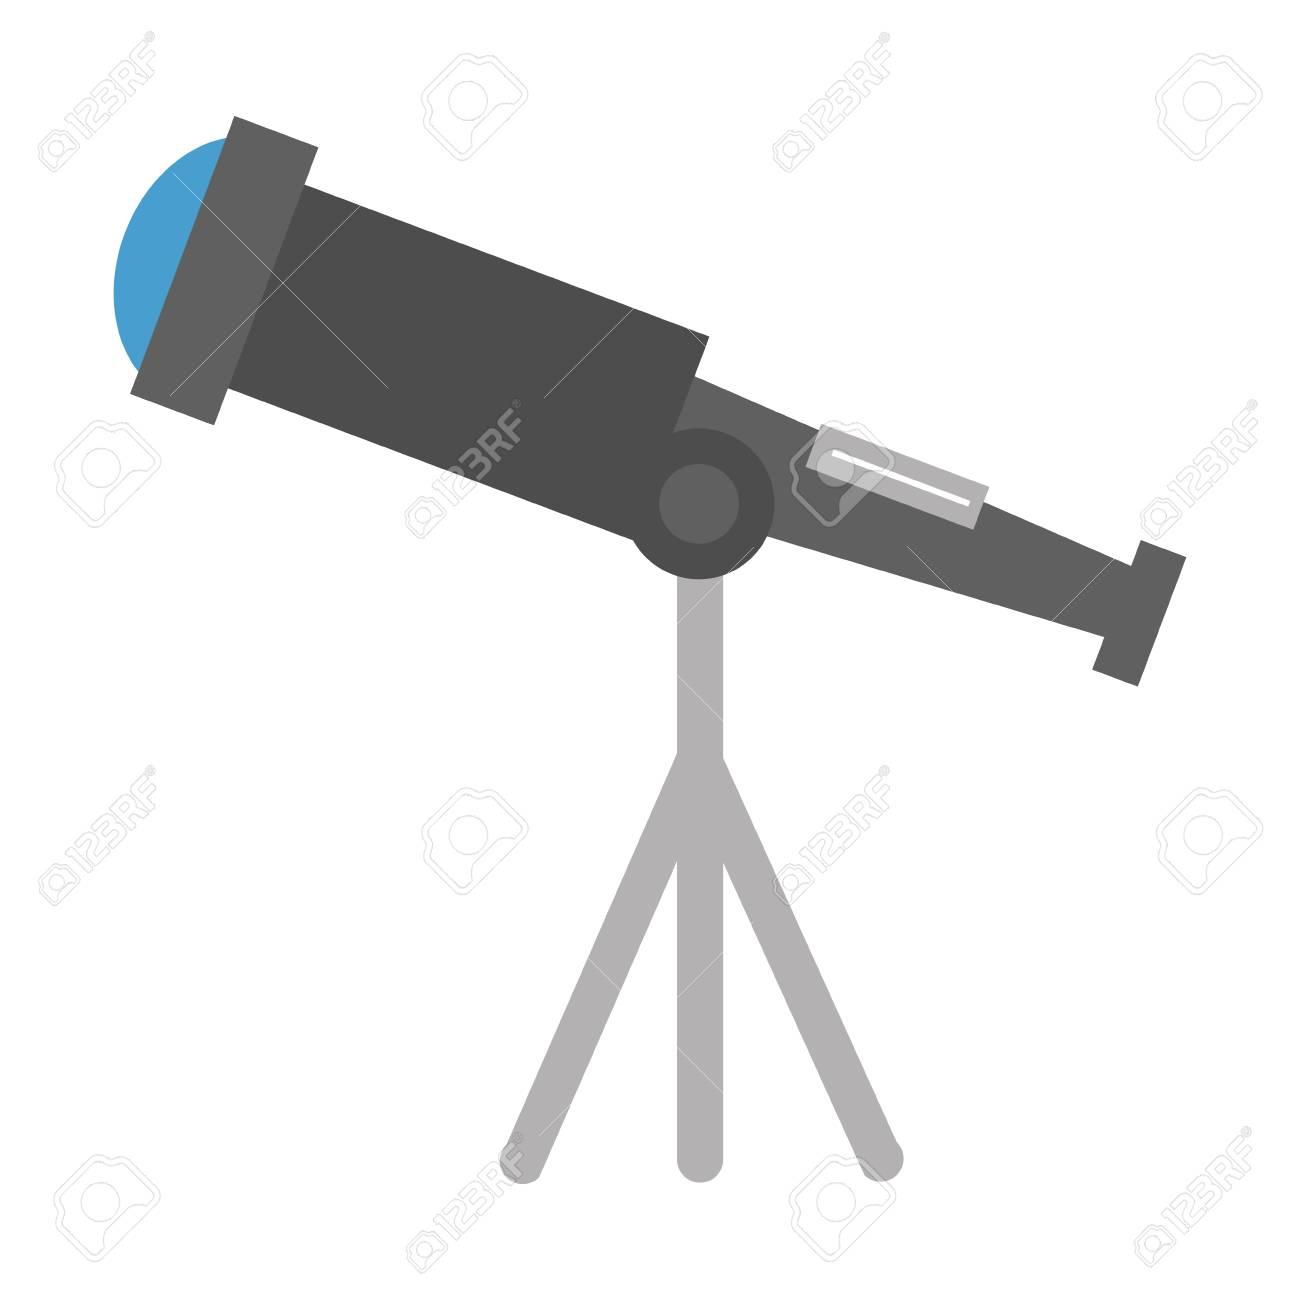 telescope device isolated icon vector illustration design - 111820119